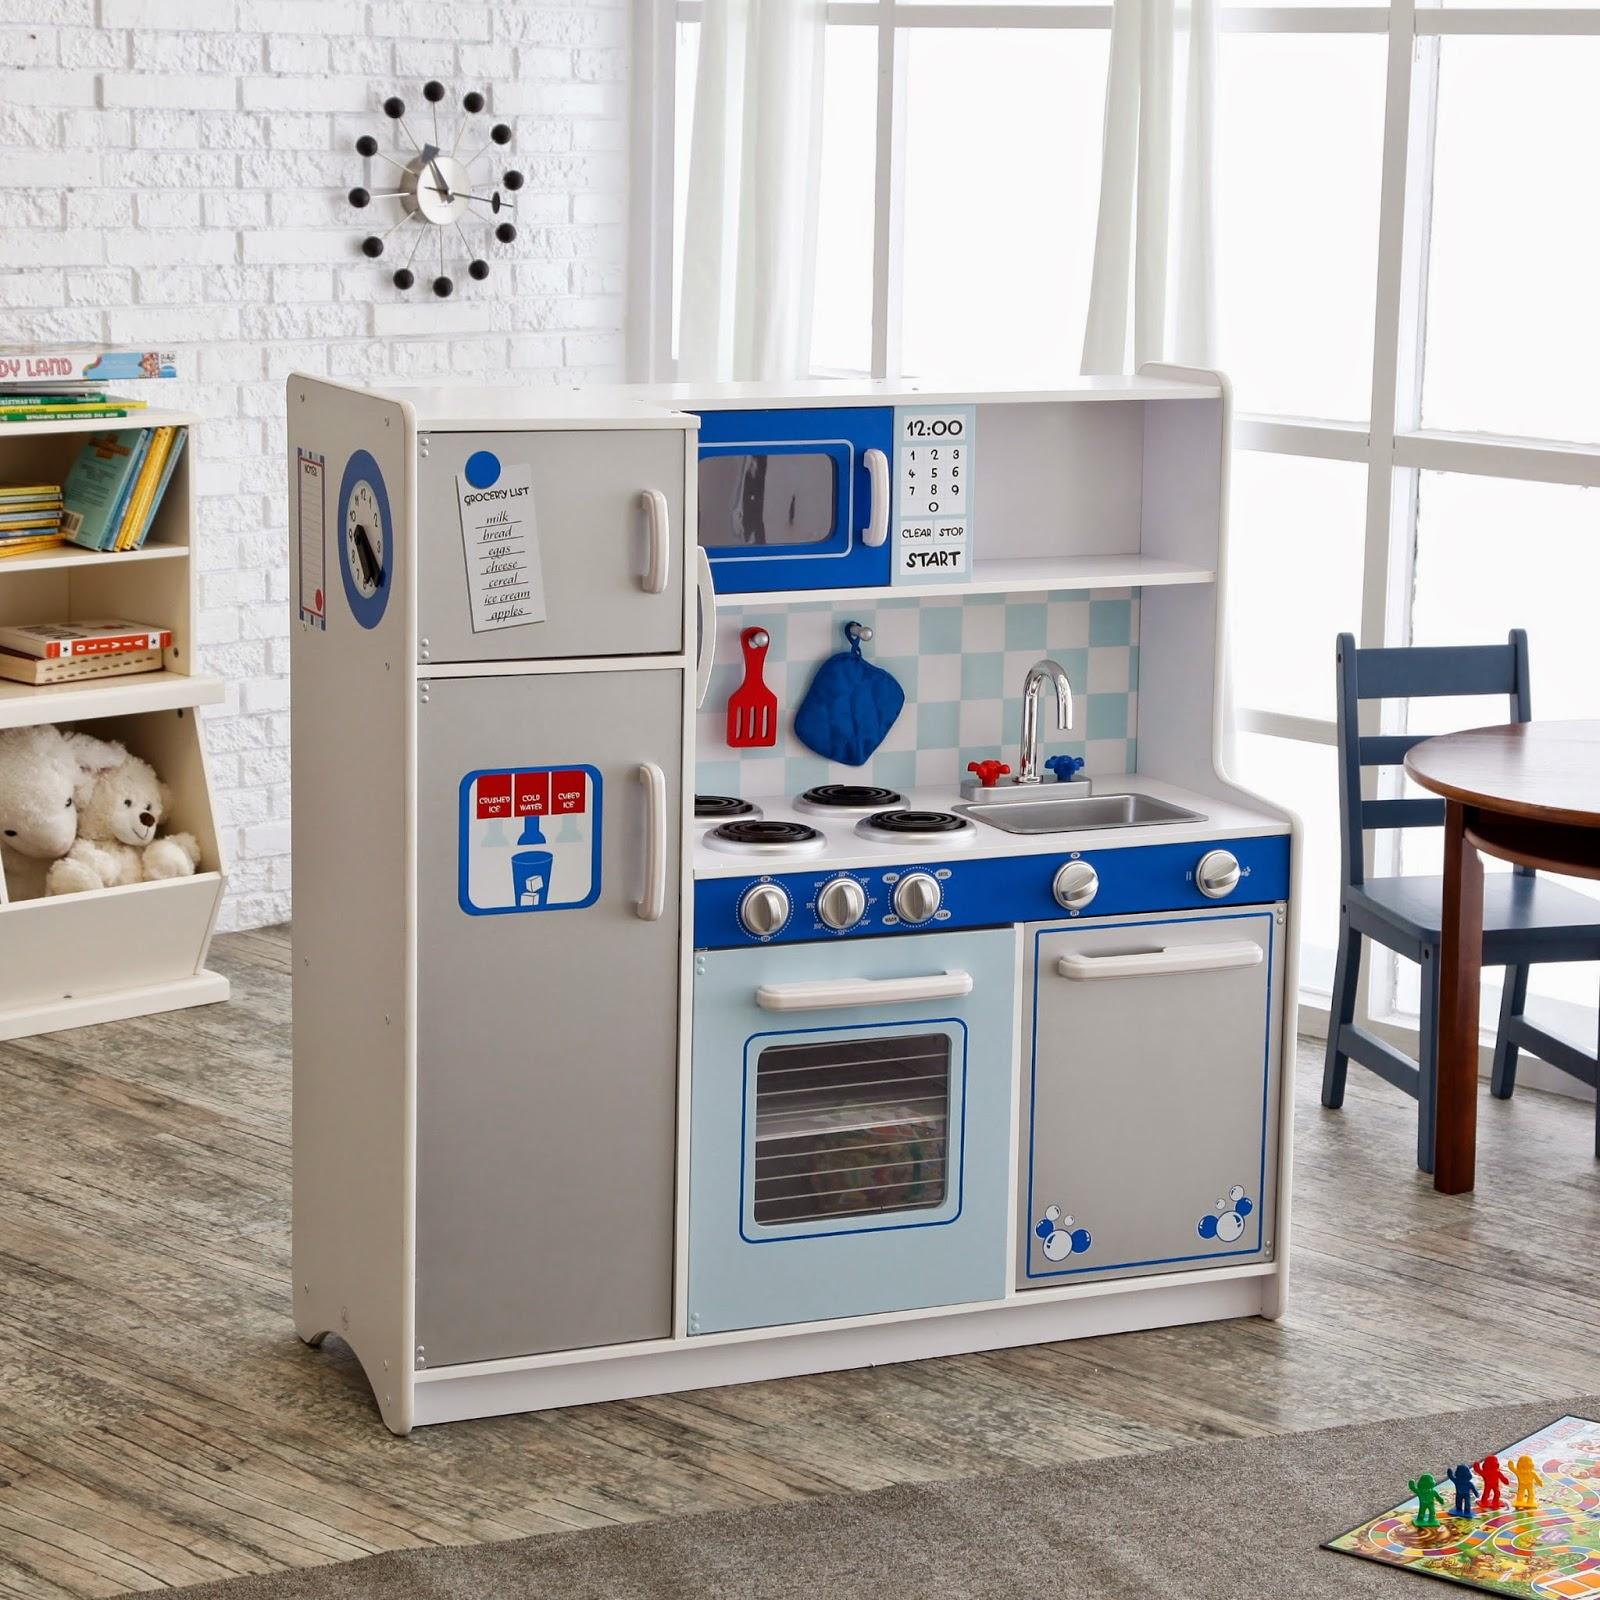 Kid Craft Kitchen Black Stainless Steel 我們看到了 我們是生活 家 美國木製玩具 傢俱製造商kidkraft 所 所推出的廚房系列